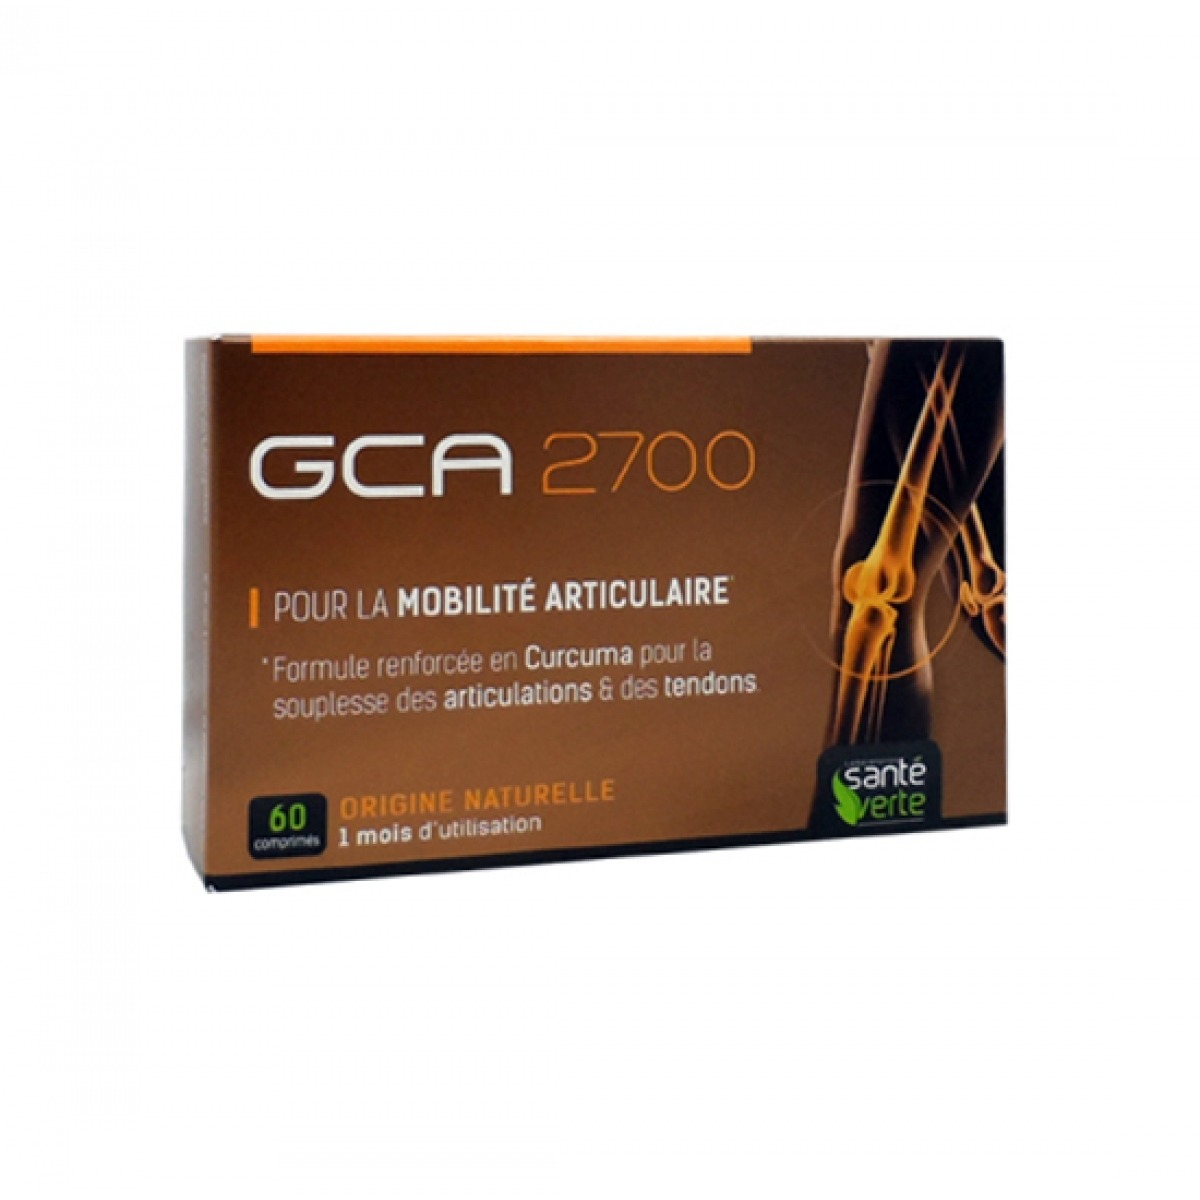 SANT VERTE GCA 2700 60 COMPRIMIDOS.